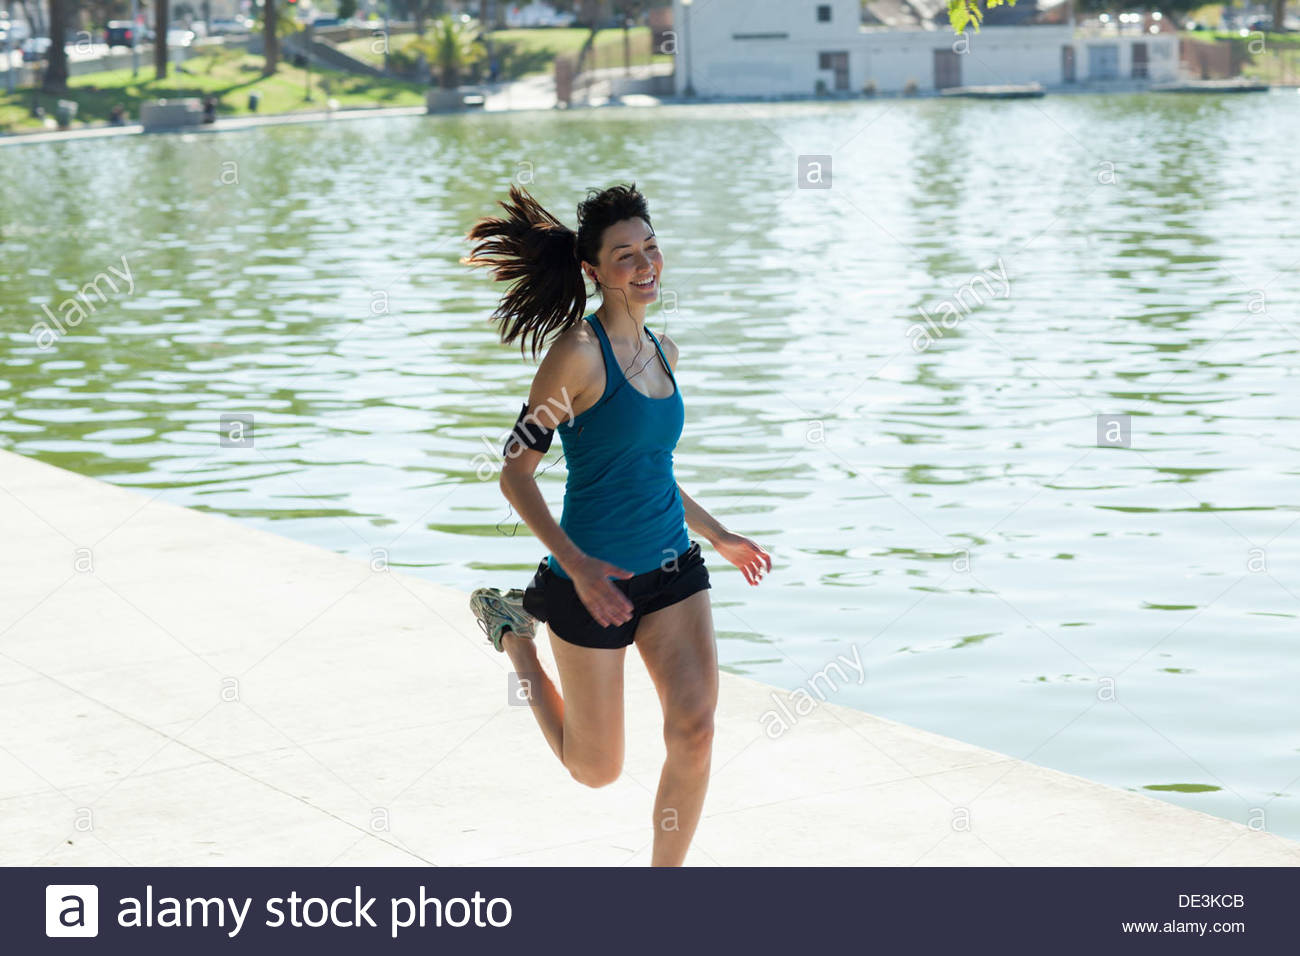 Woman running along lake - Stock Image